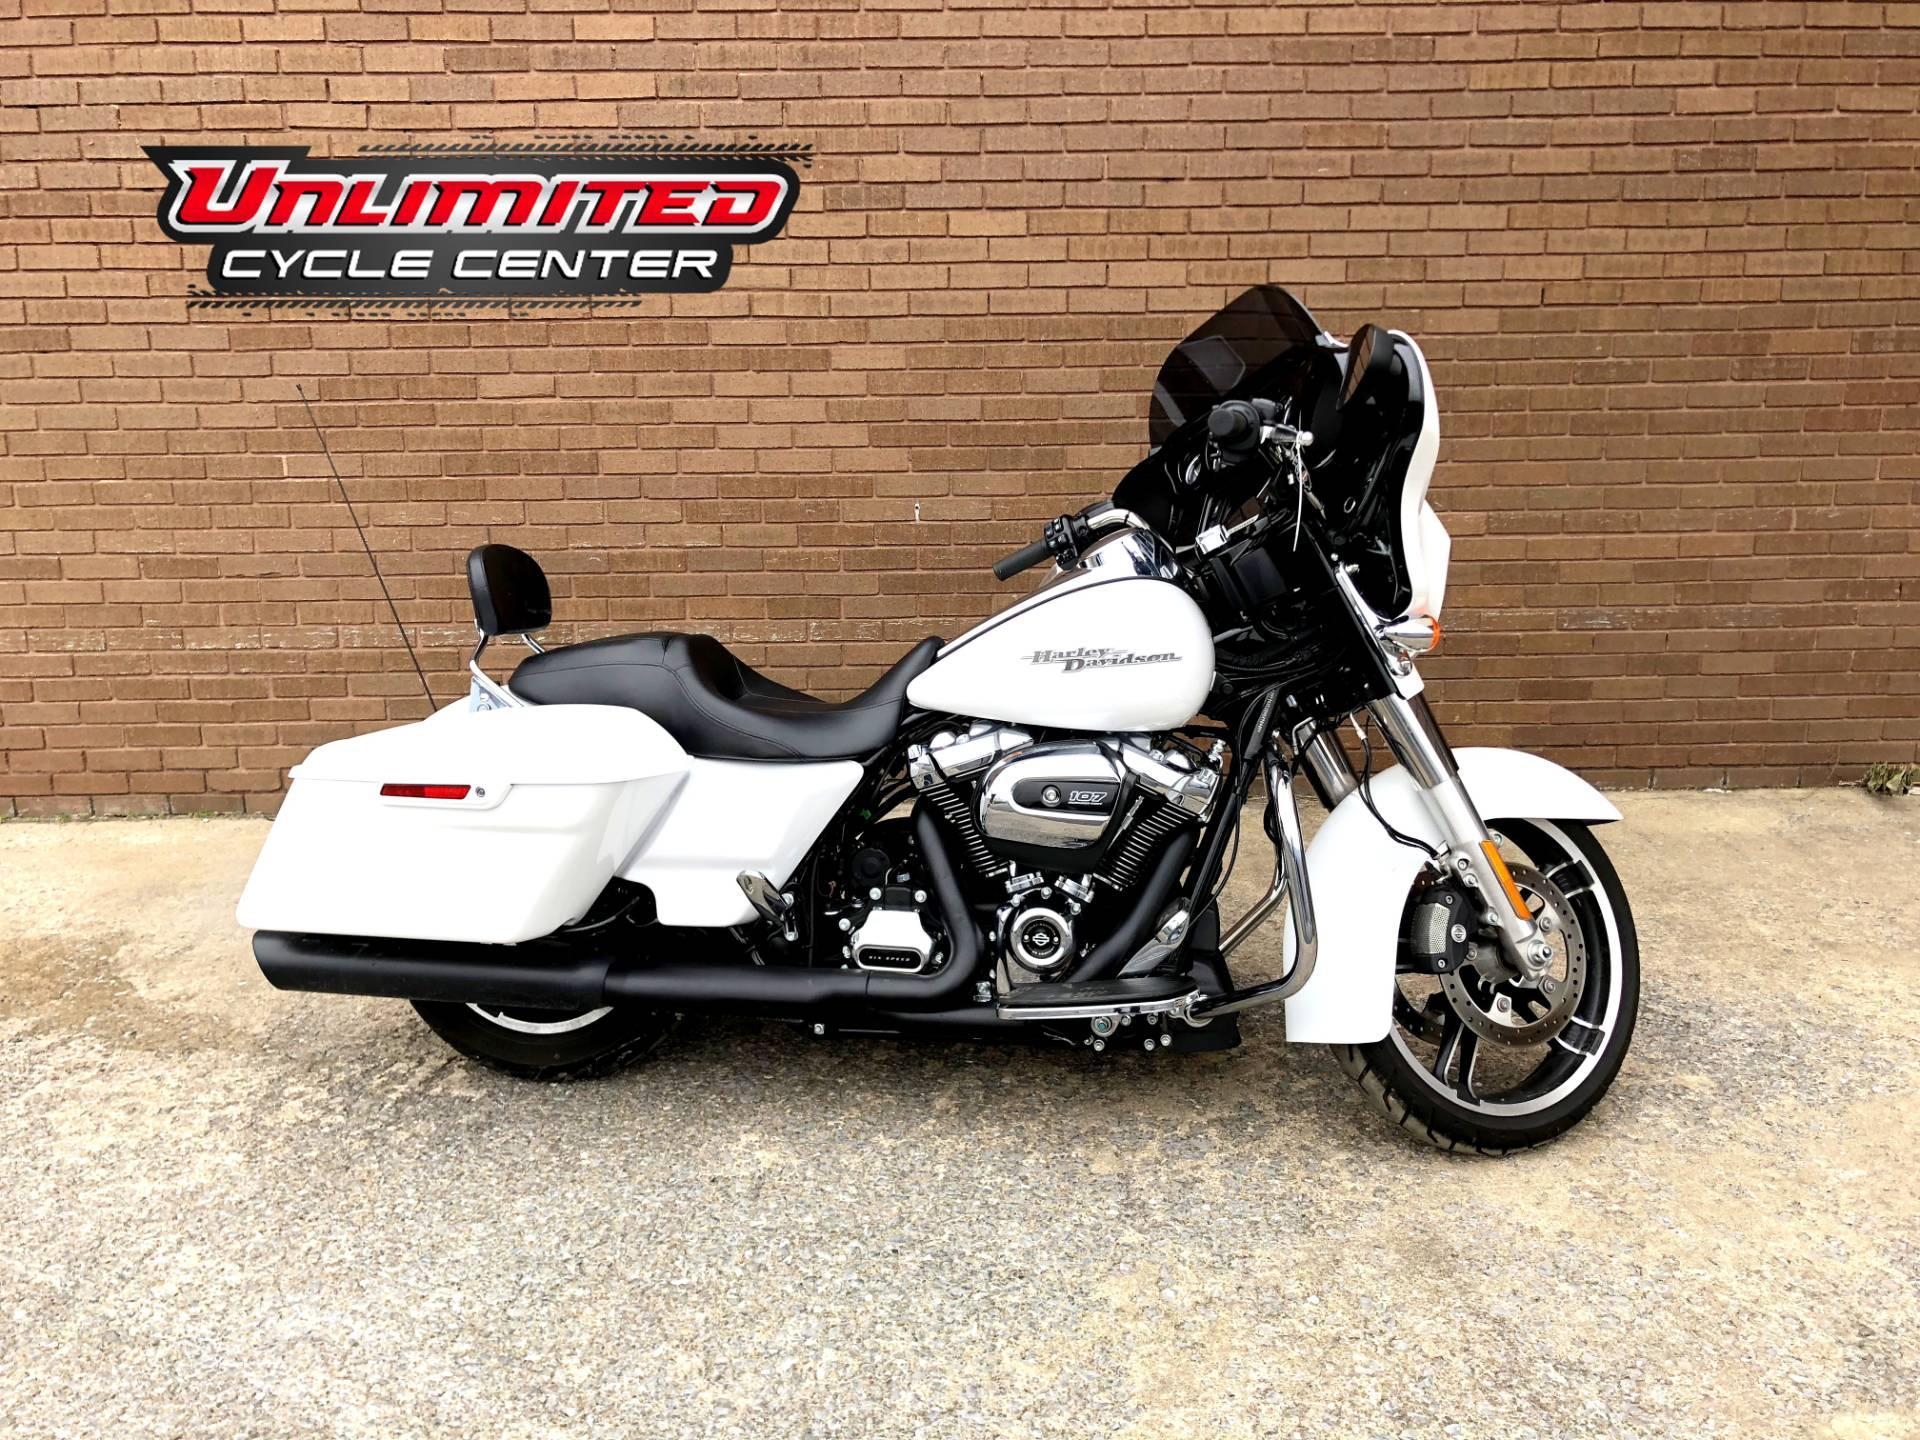 2017 Harley-Davidson Street Glide® Special in Tyrone, Pennsylvania - Photo 1